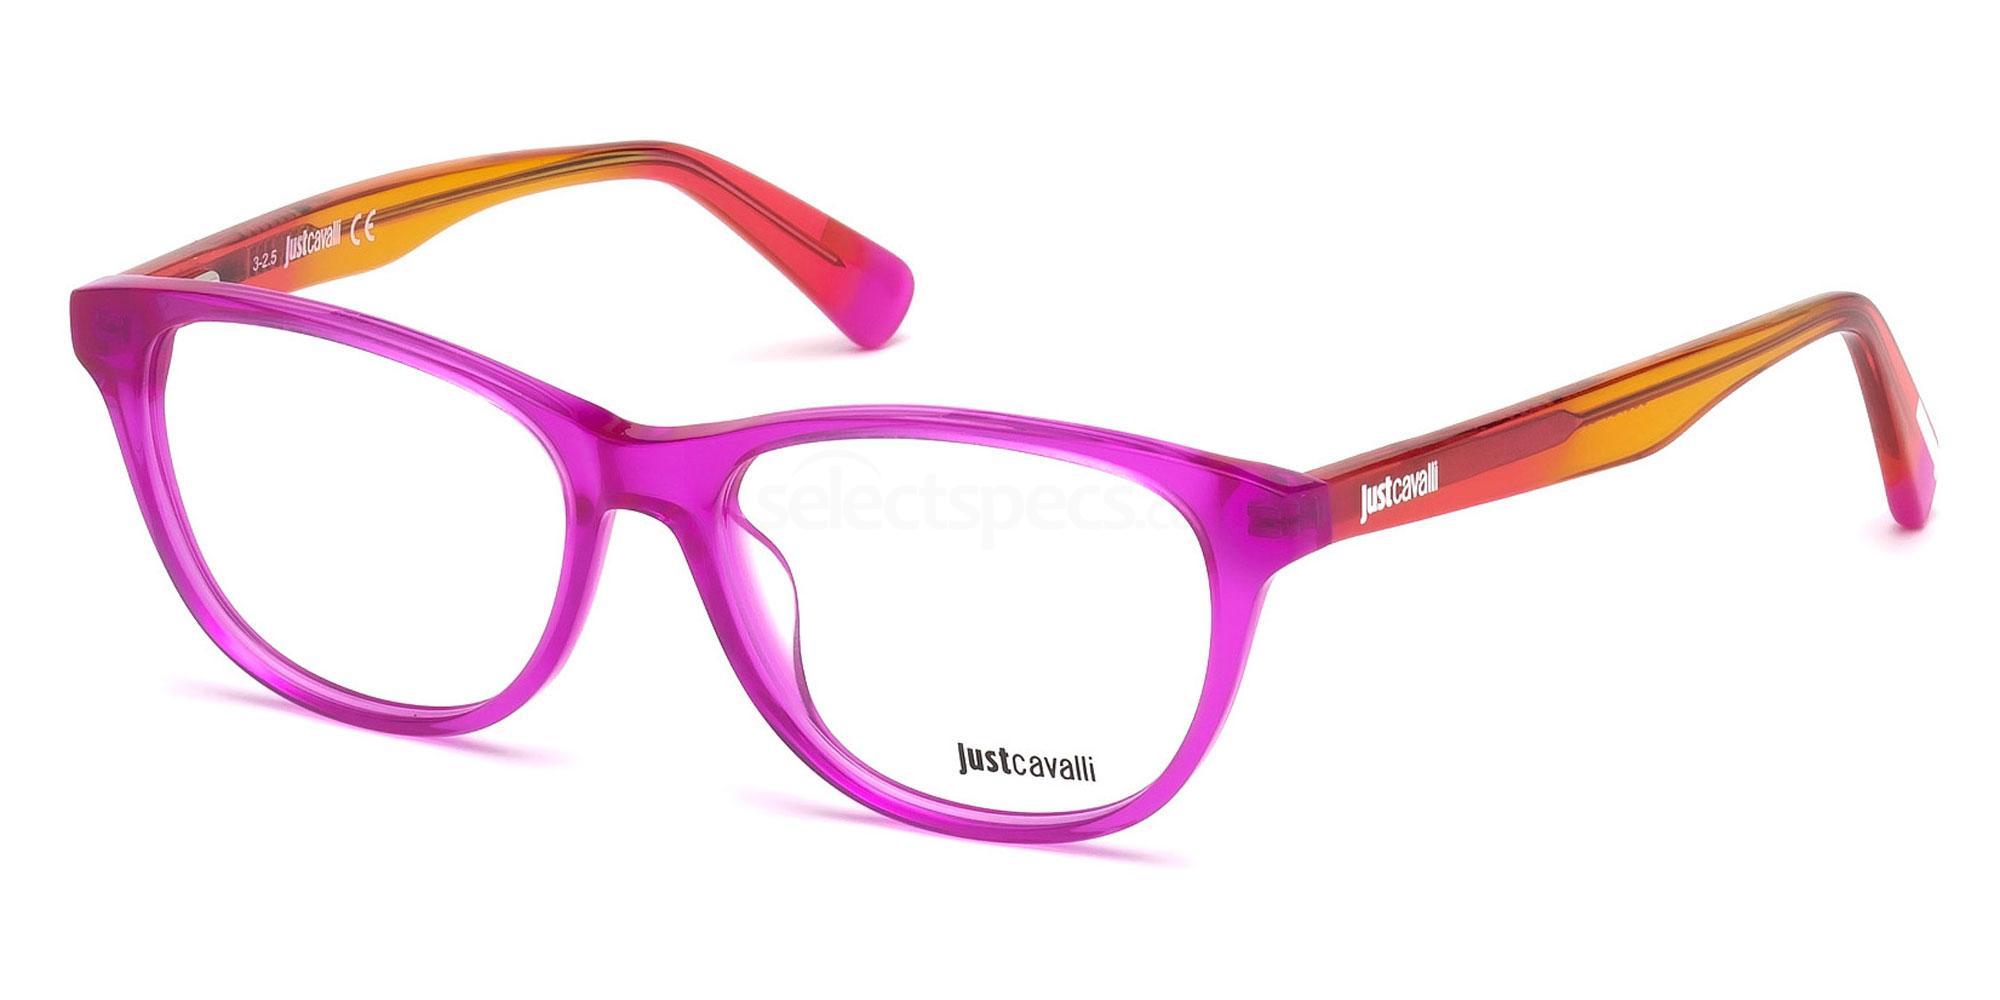 075 JC0751 Glasses, Just Cavalli